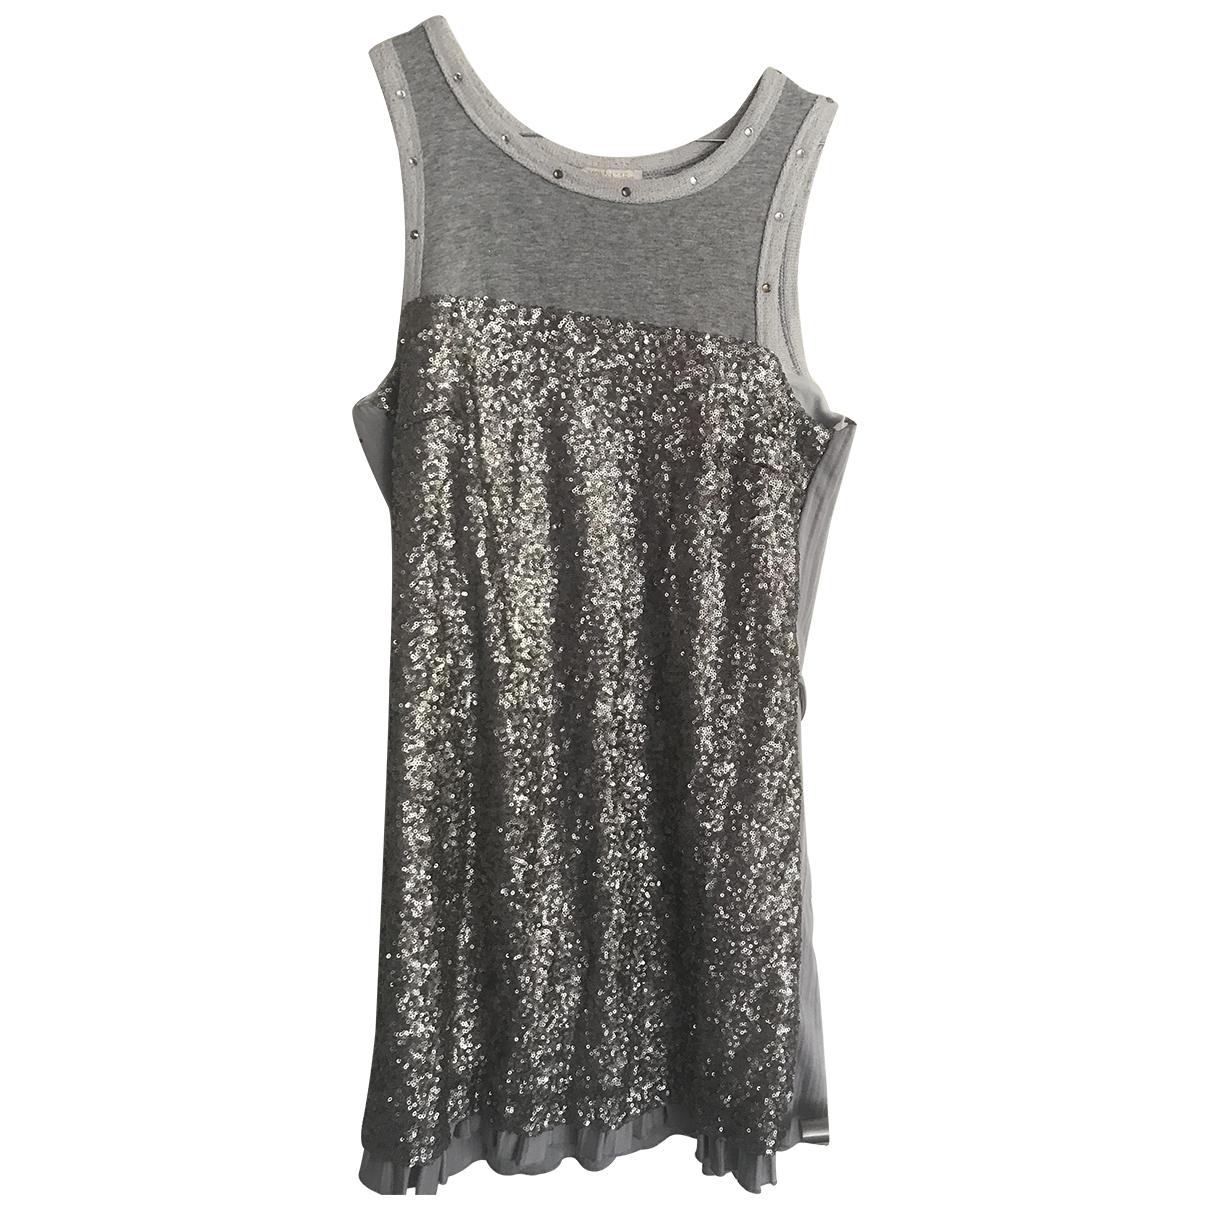 Monnalisa N Grey Glitter dress for Kids 16 years - M FR